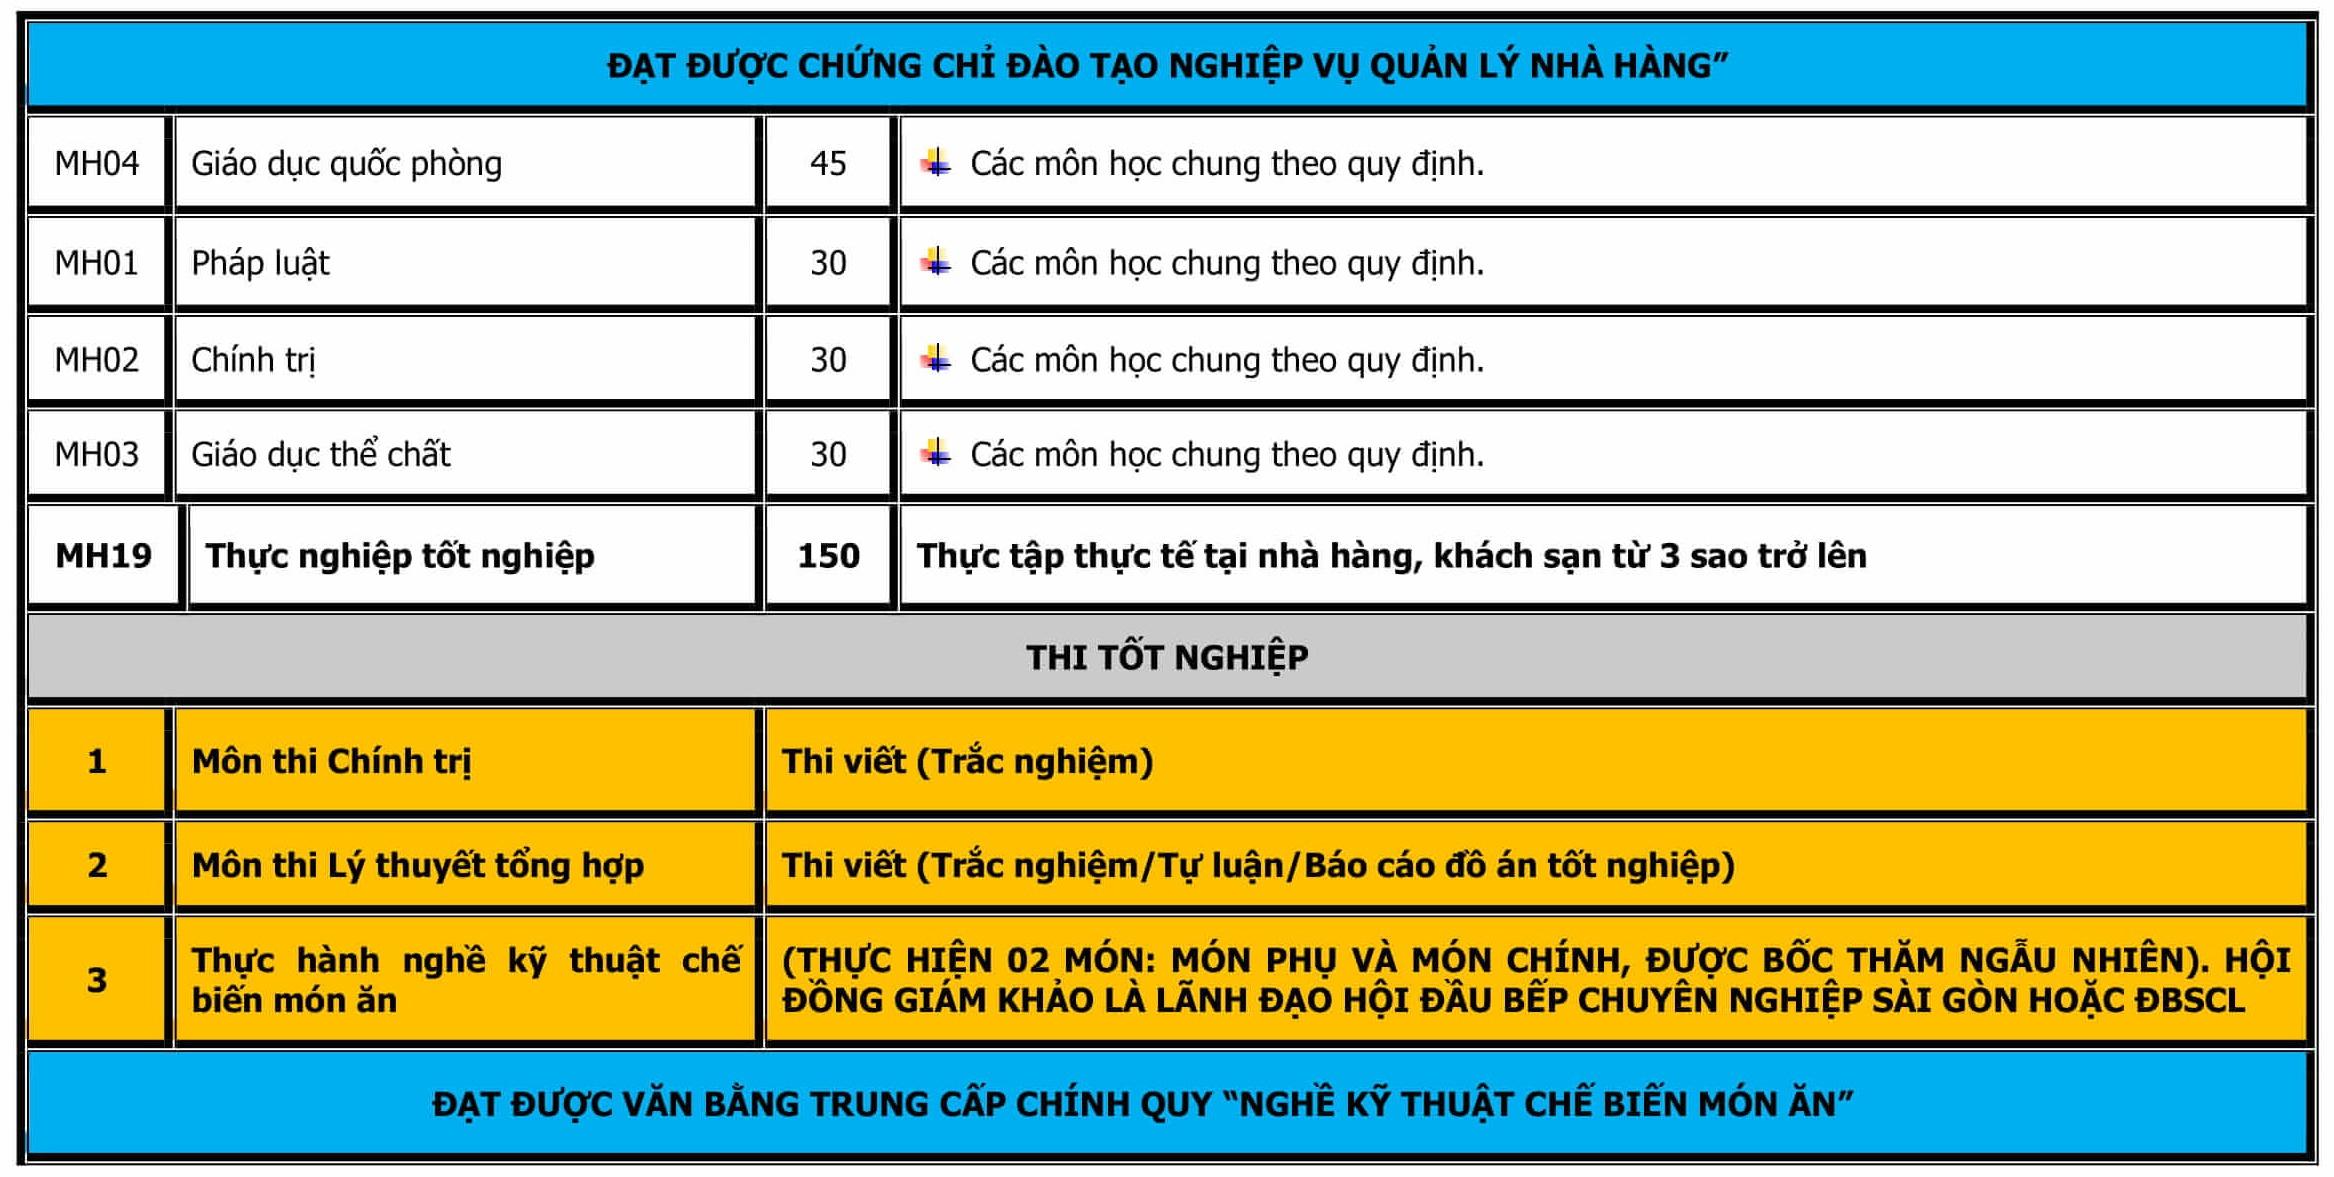 CT DAO TAO TRUNG CAP NAU AN-5